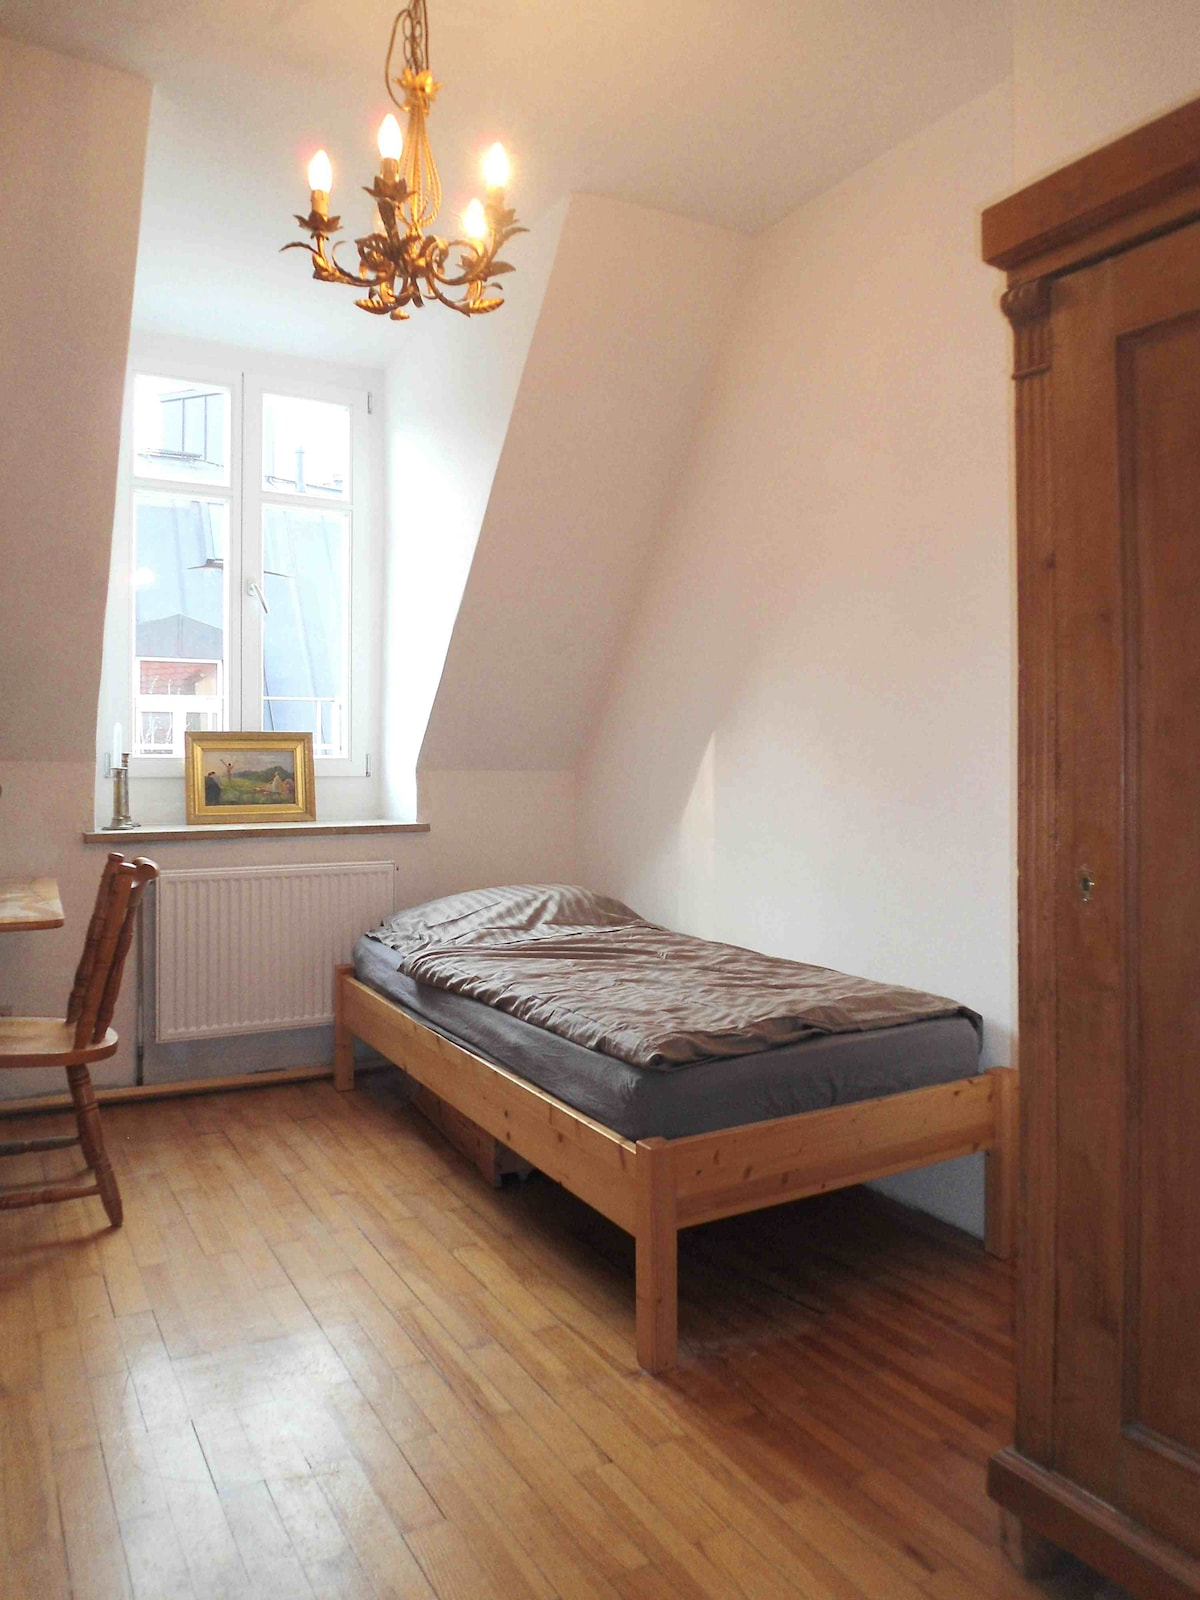 Enjoy it simple , bright, bed, chair, desk , Schrank,